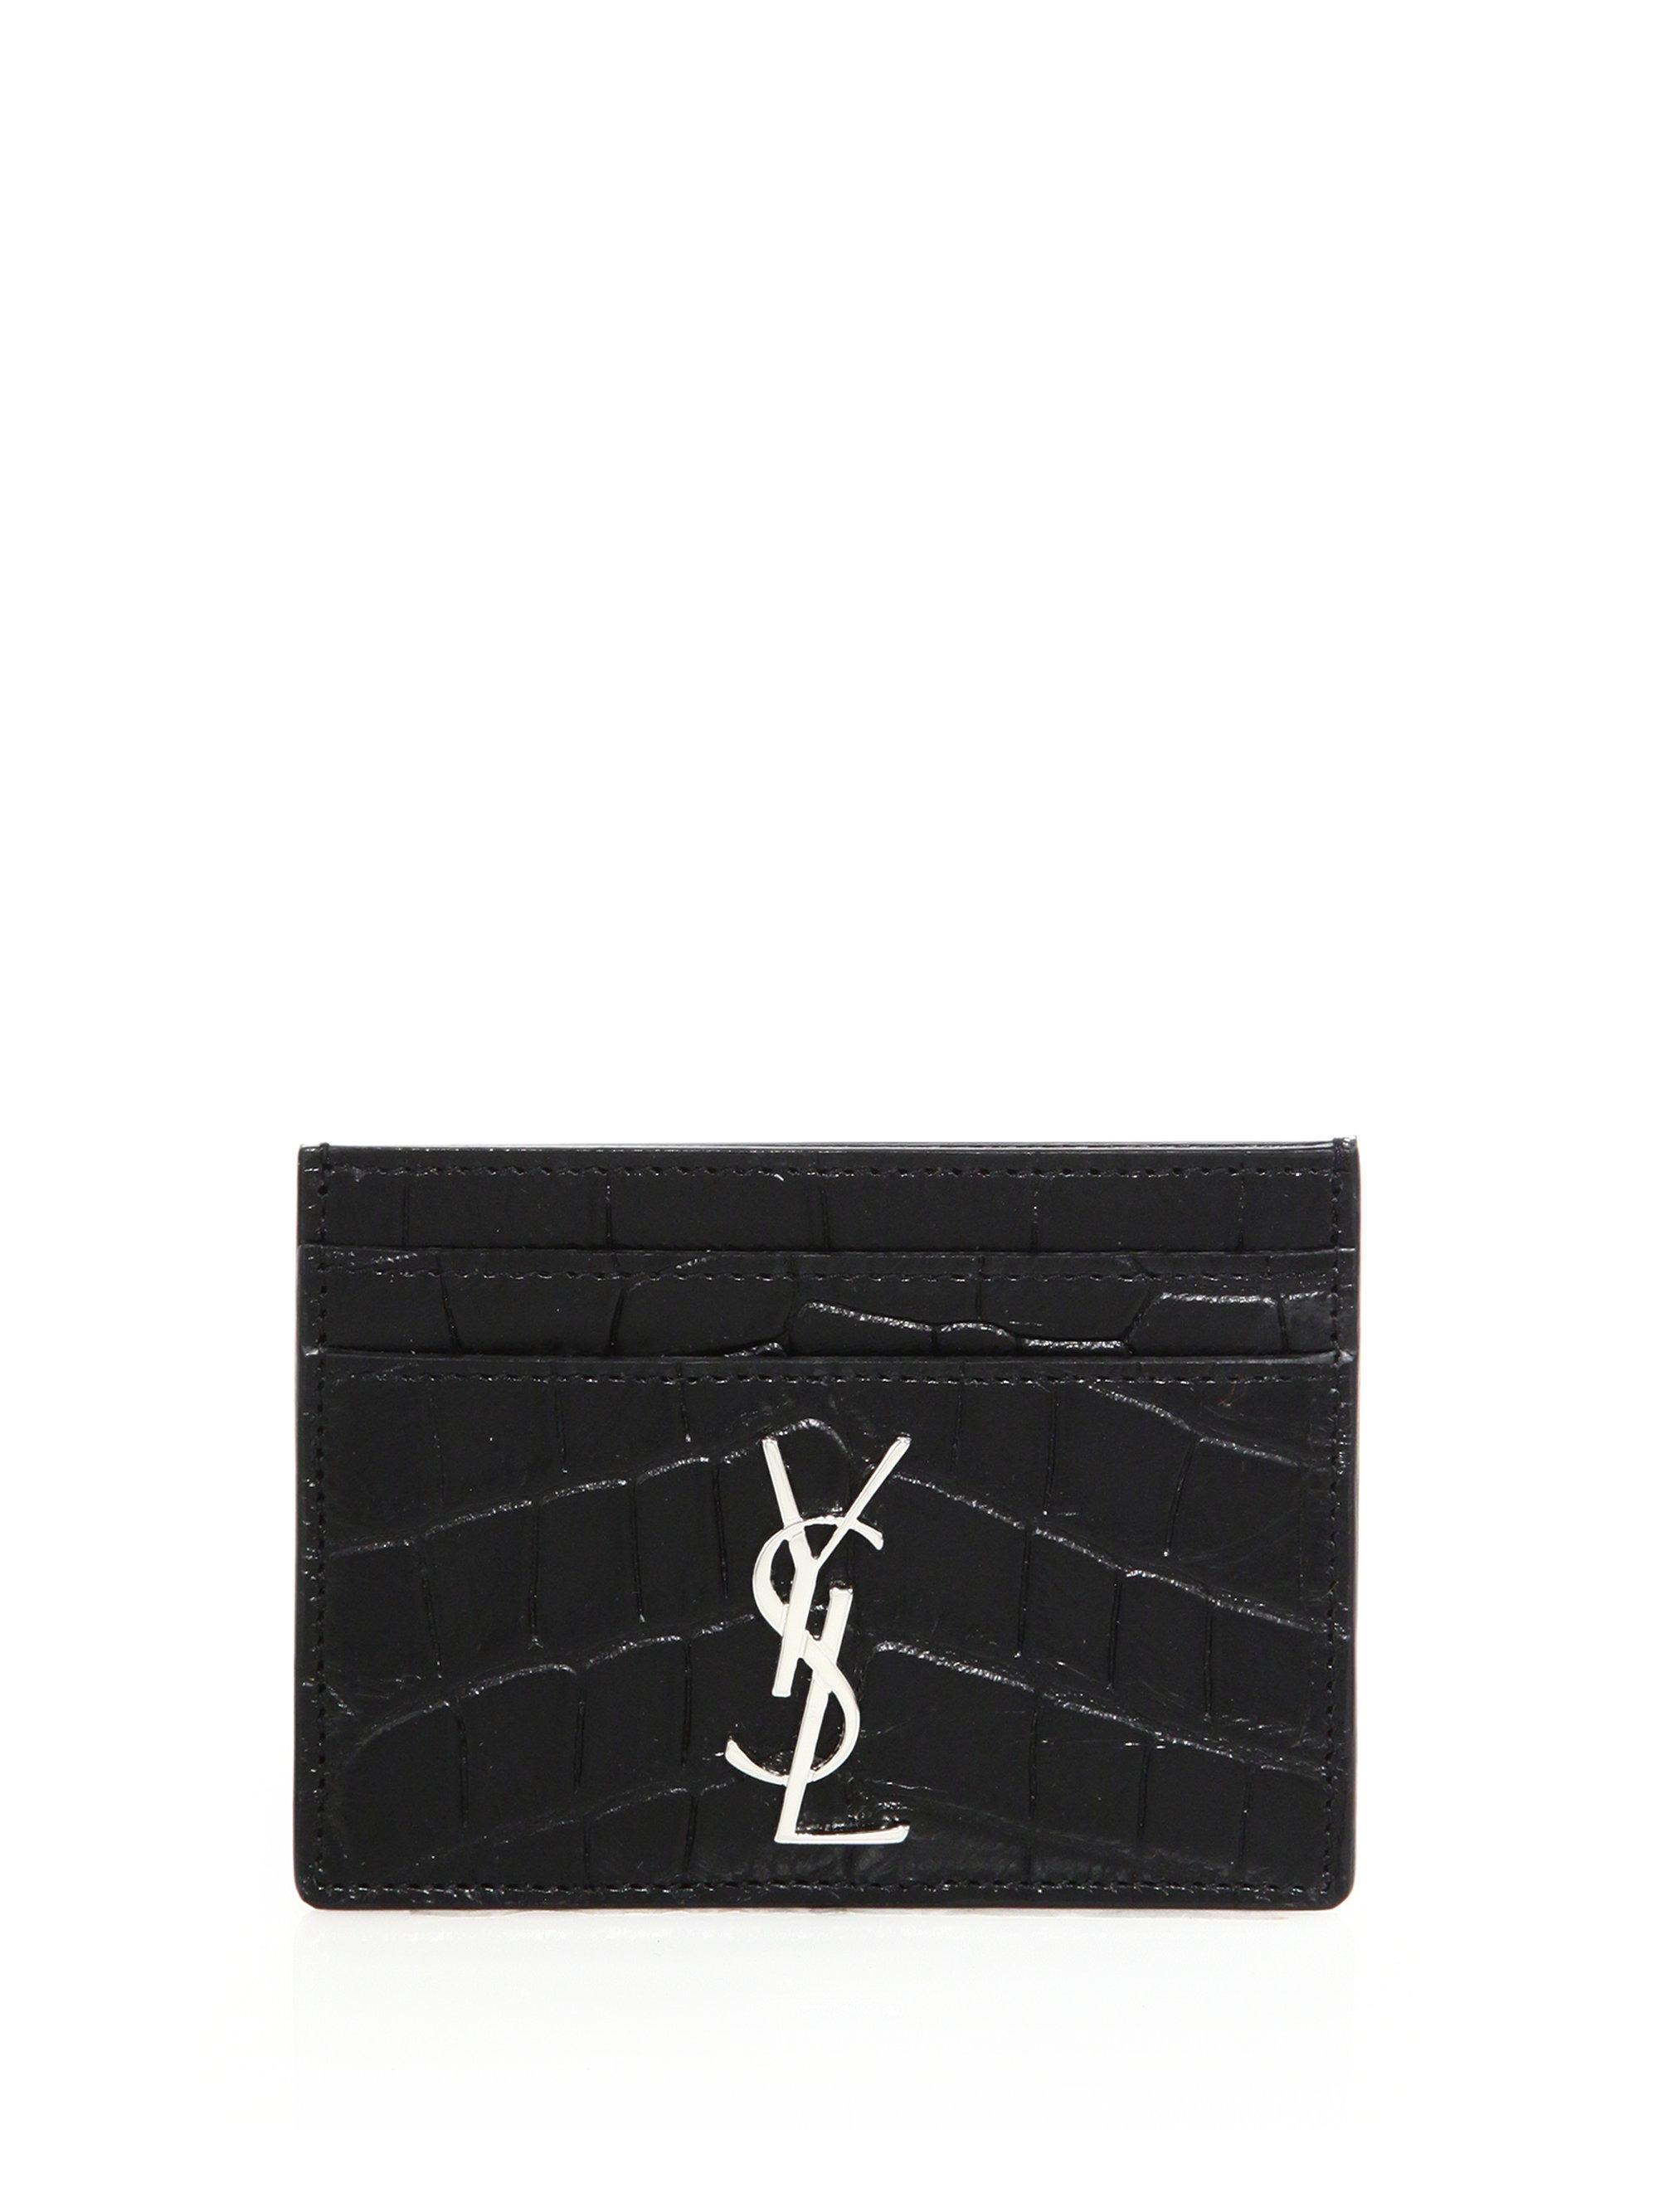 Lyst - Saint Laurent Monogram Crocodile-embossed Leather Card Case in Black